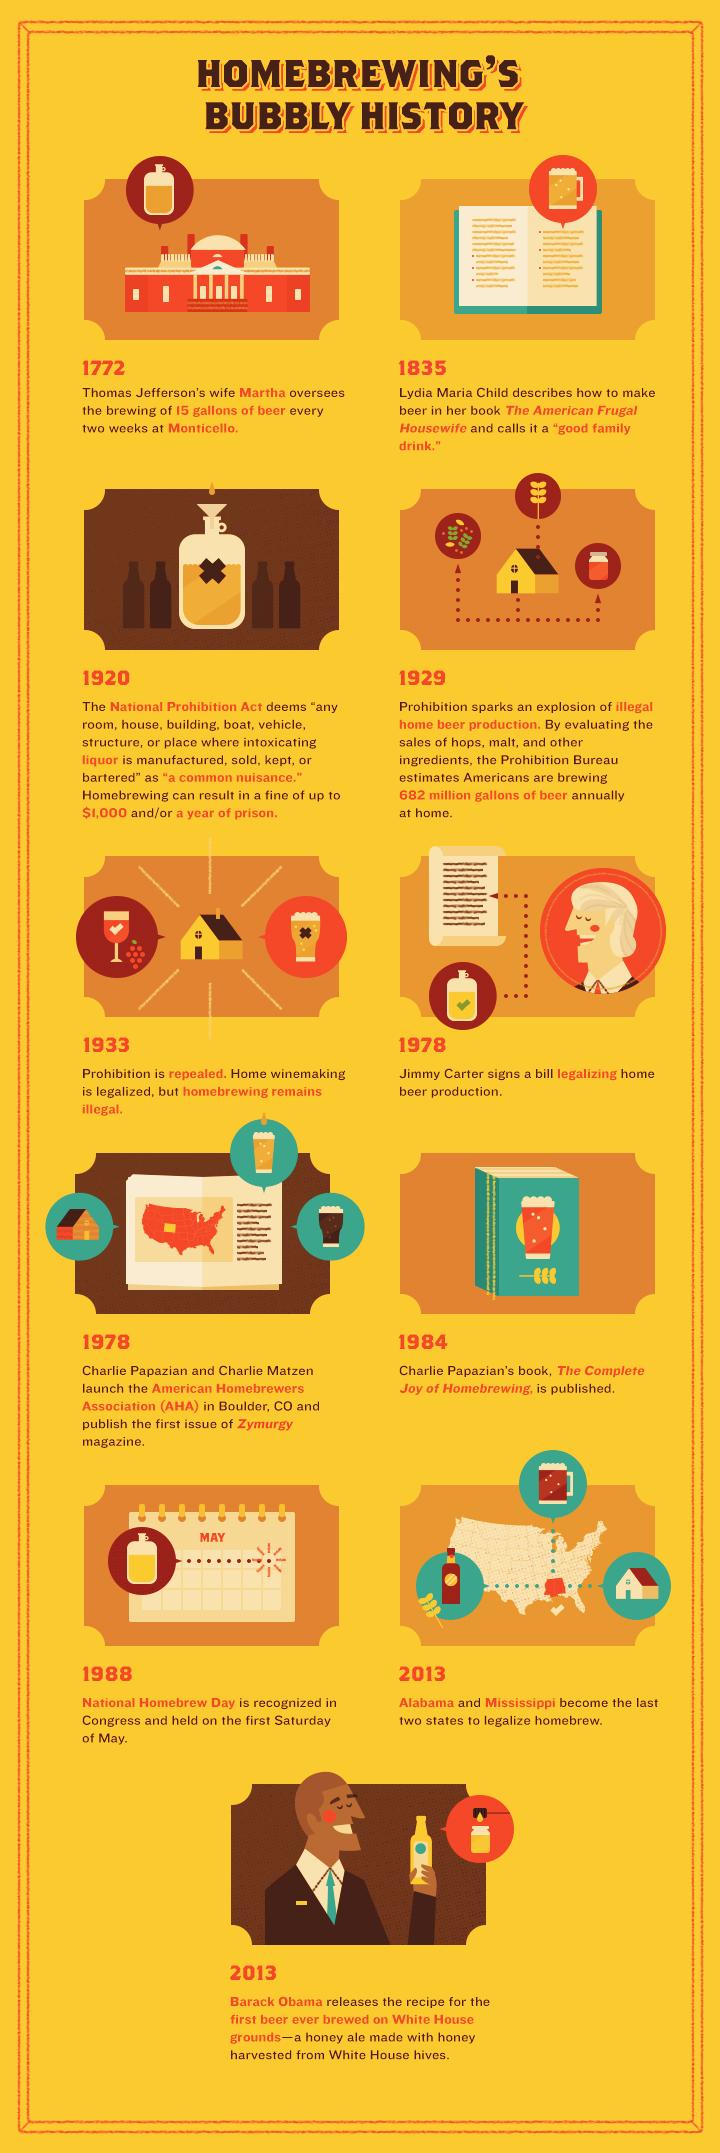 Homebrewing's History